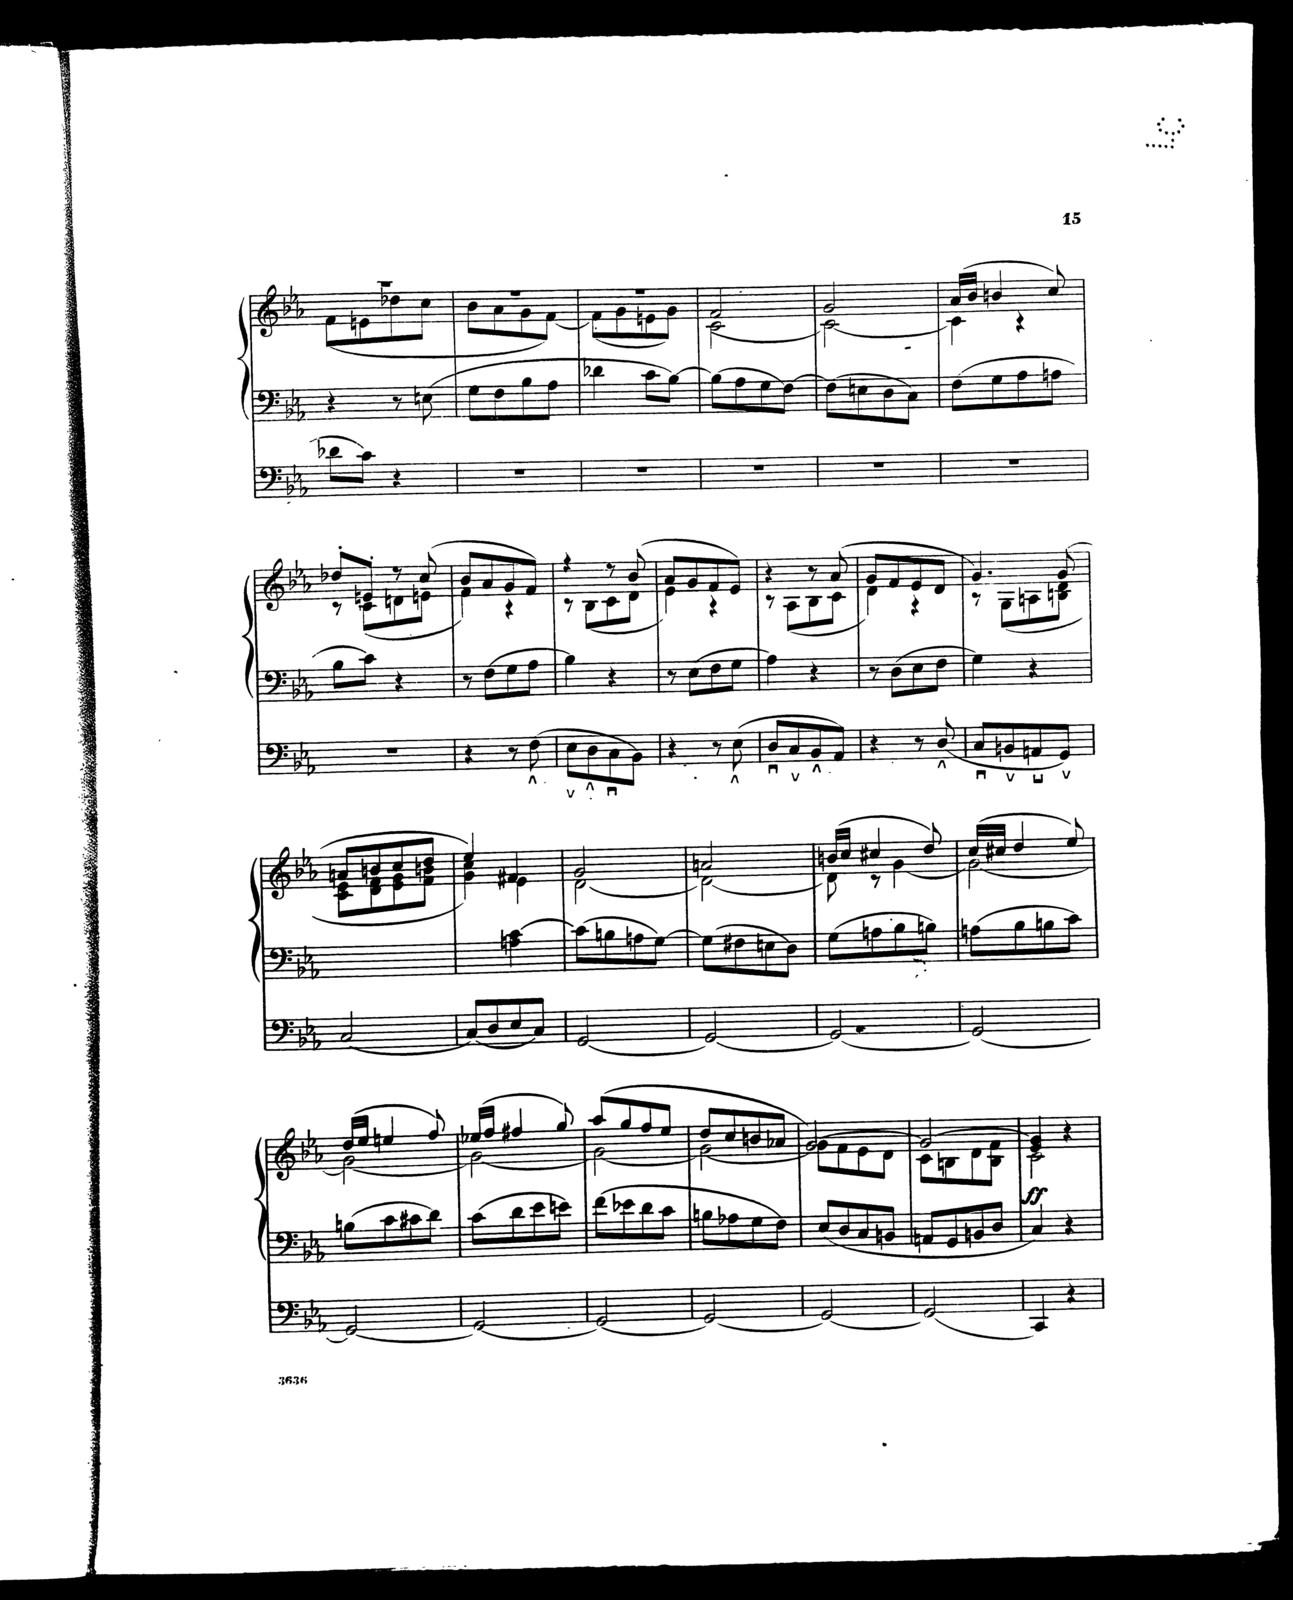 Third sonata in c minor